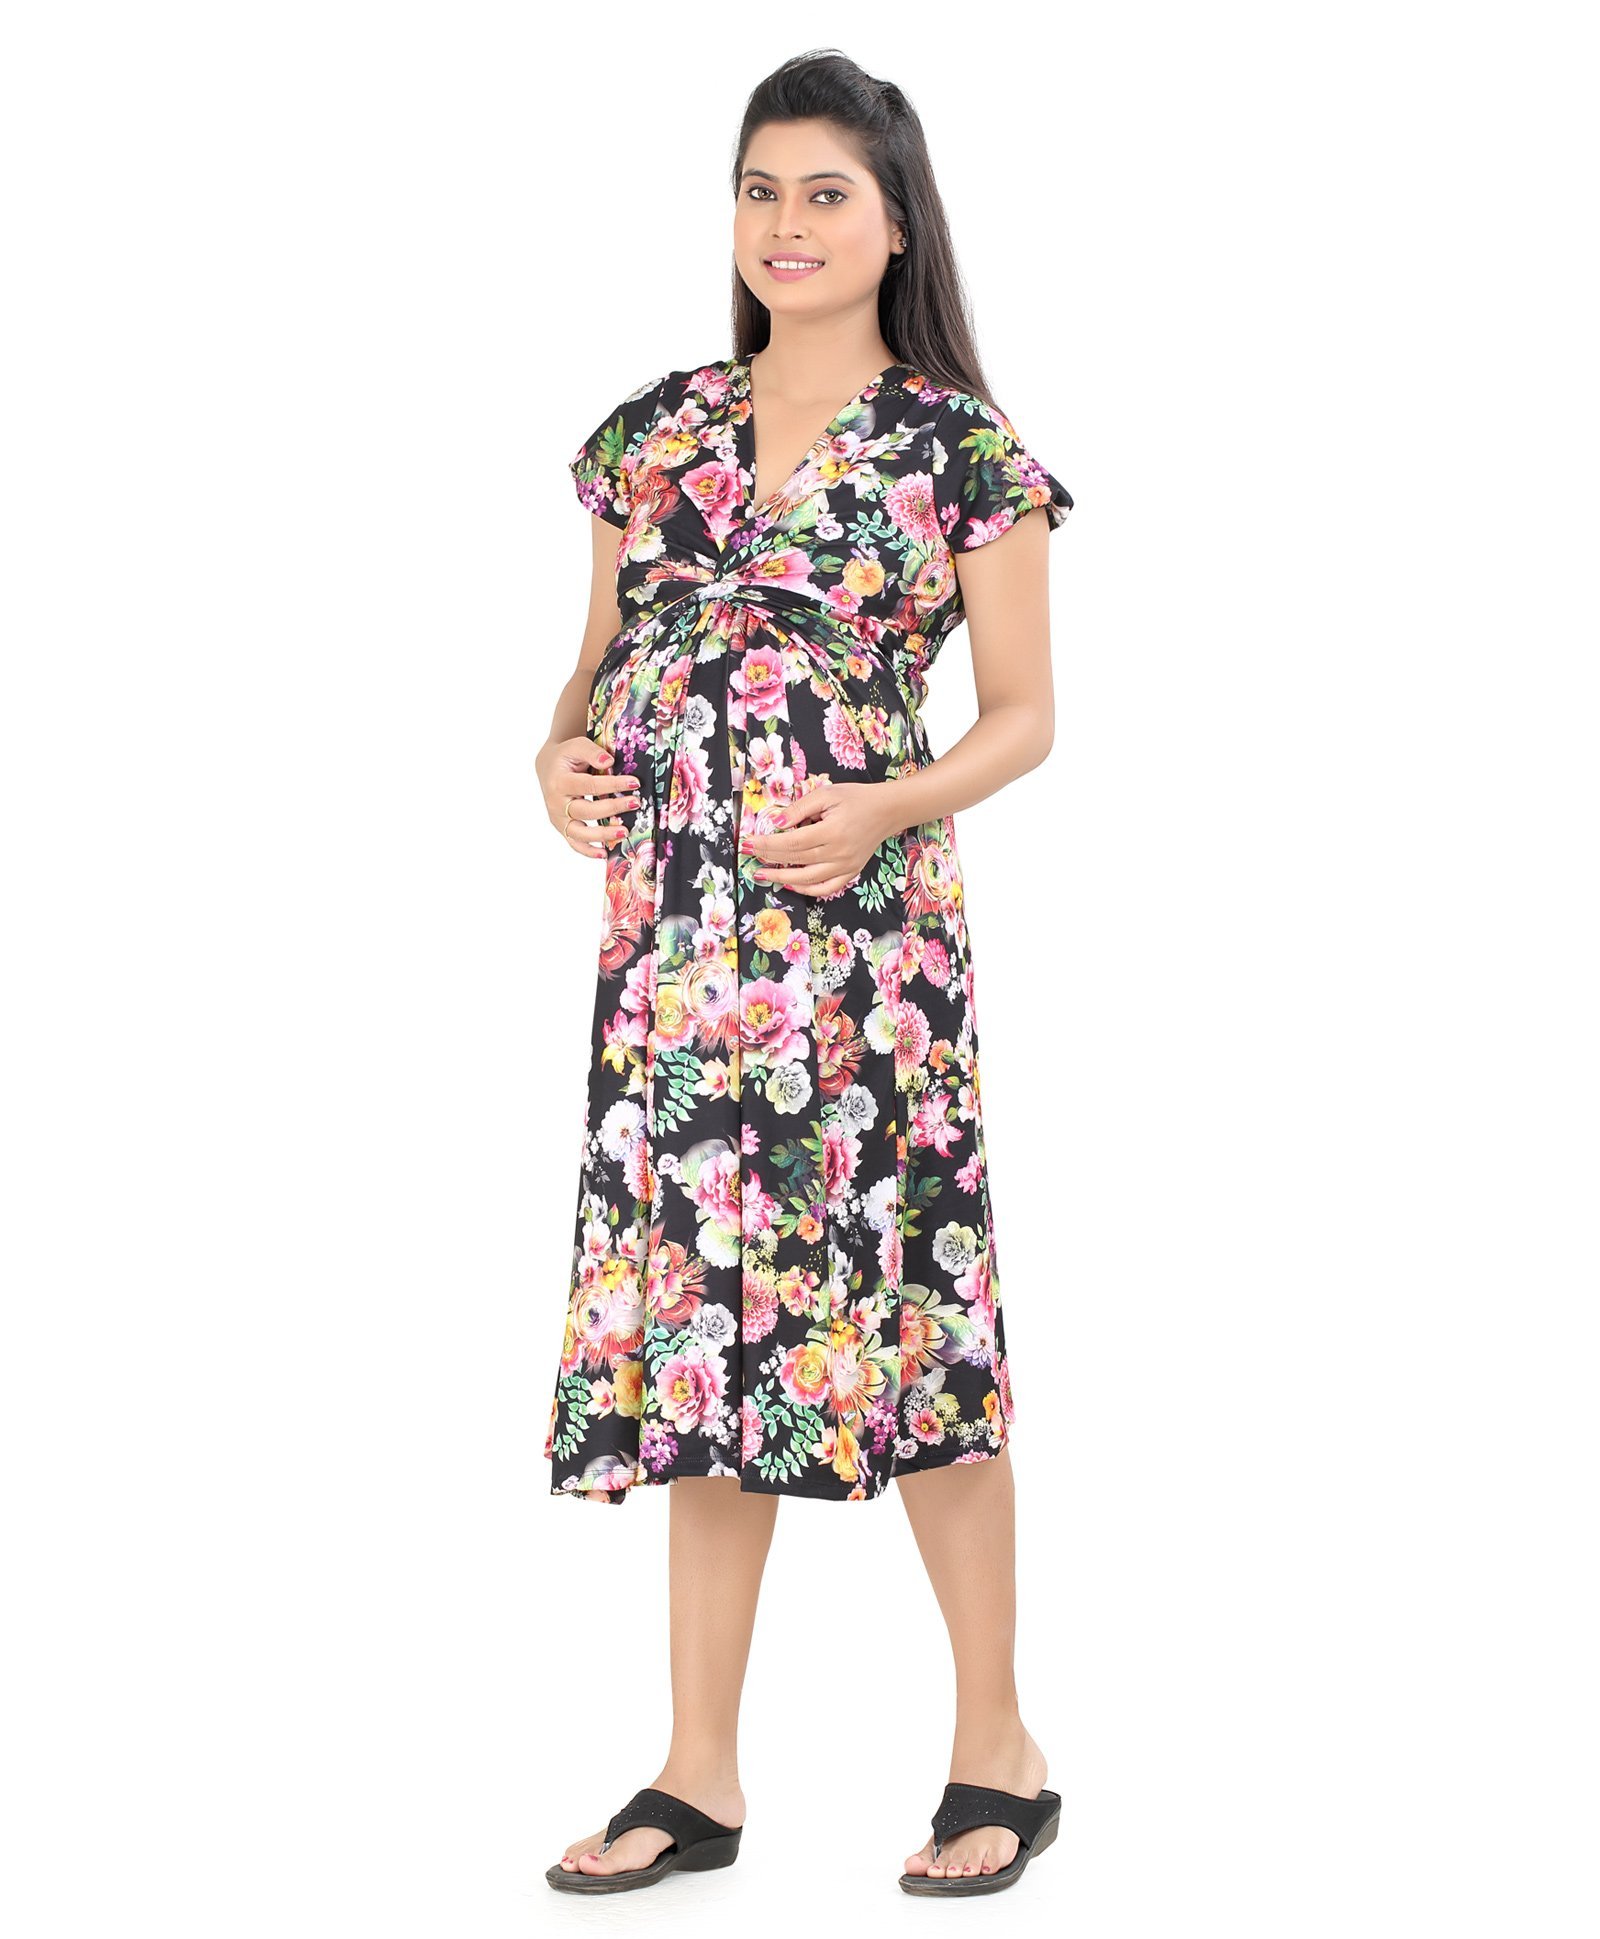 42c431e0c22fc Uzazi Short Sleeves Maternity Dress Floral Print Black Online in India ...